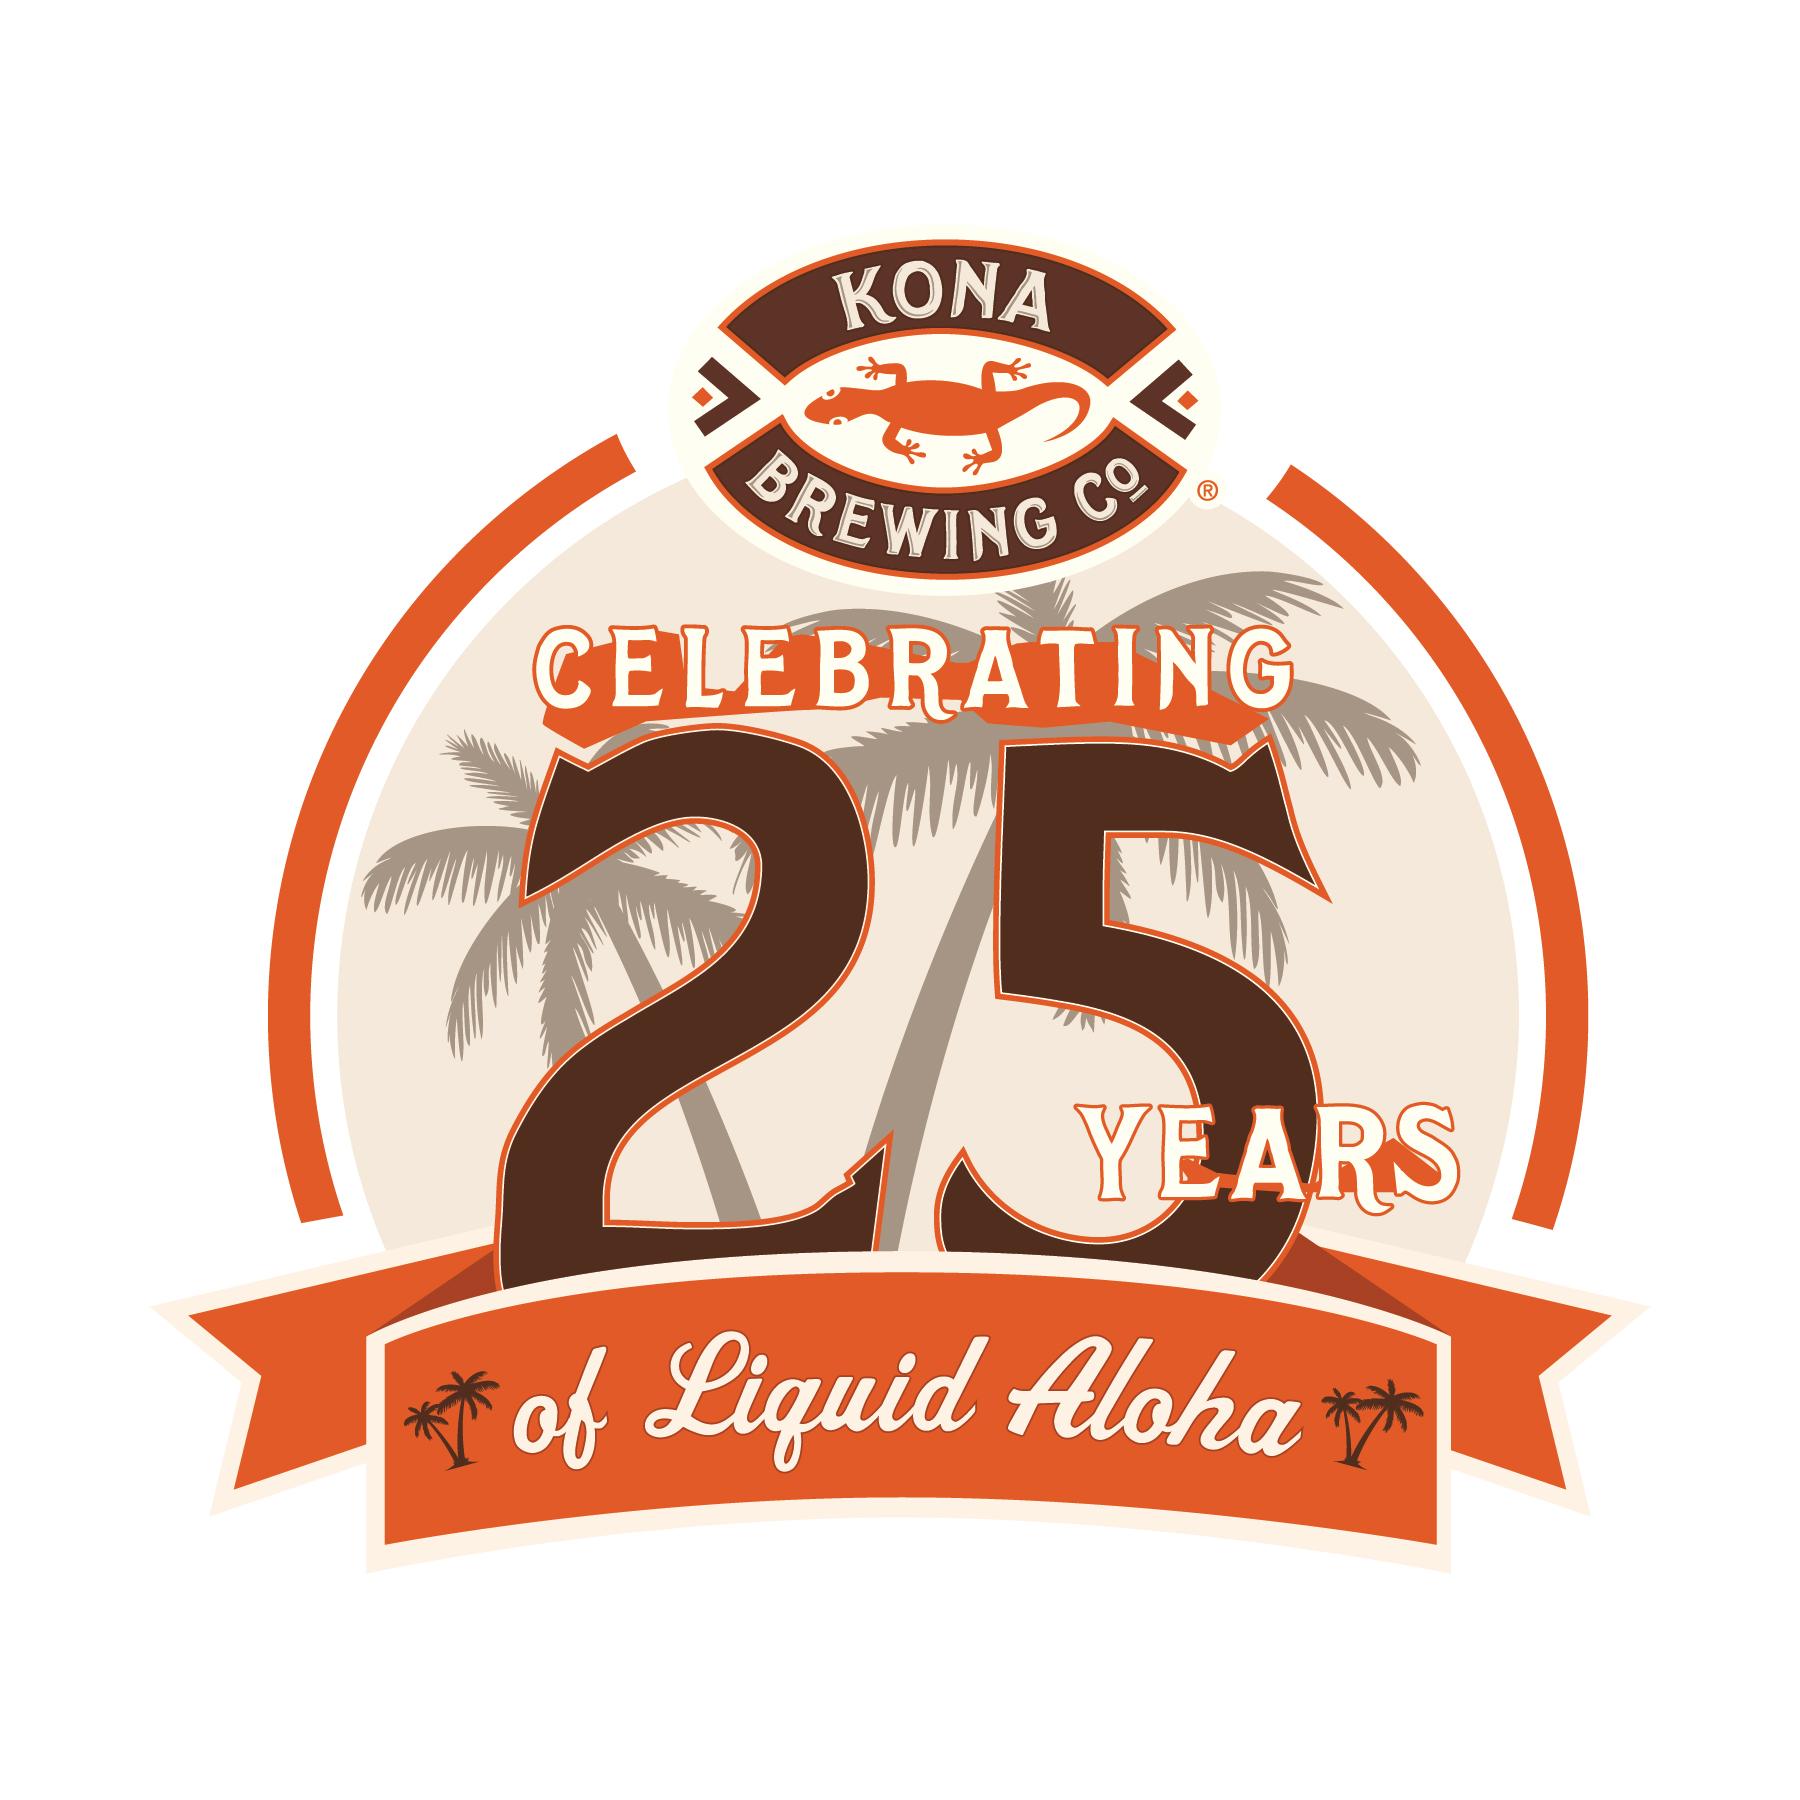 Kona Brewing Company Celebrates 25th Anniversary by Sharing the